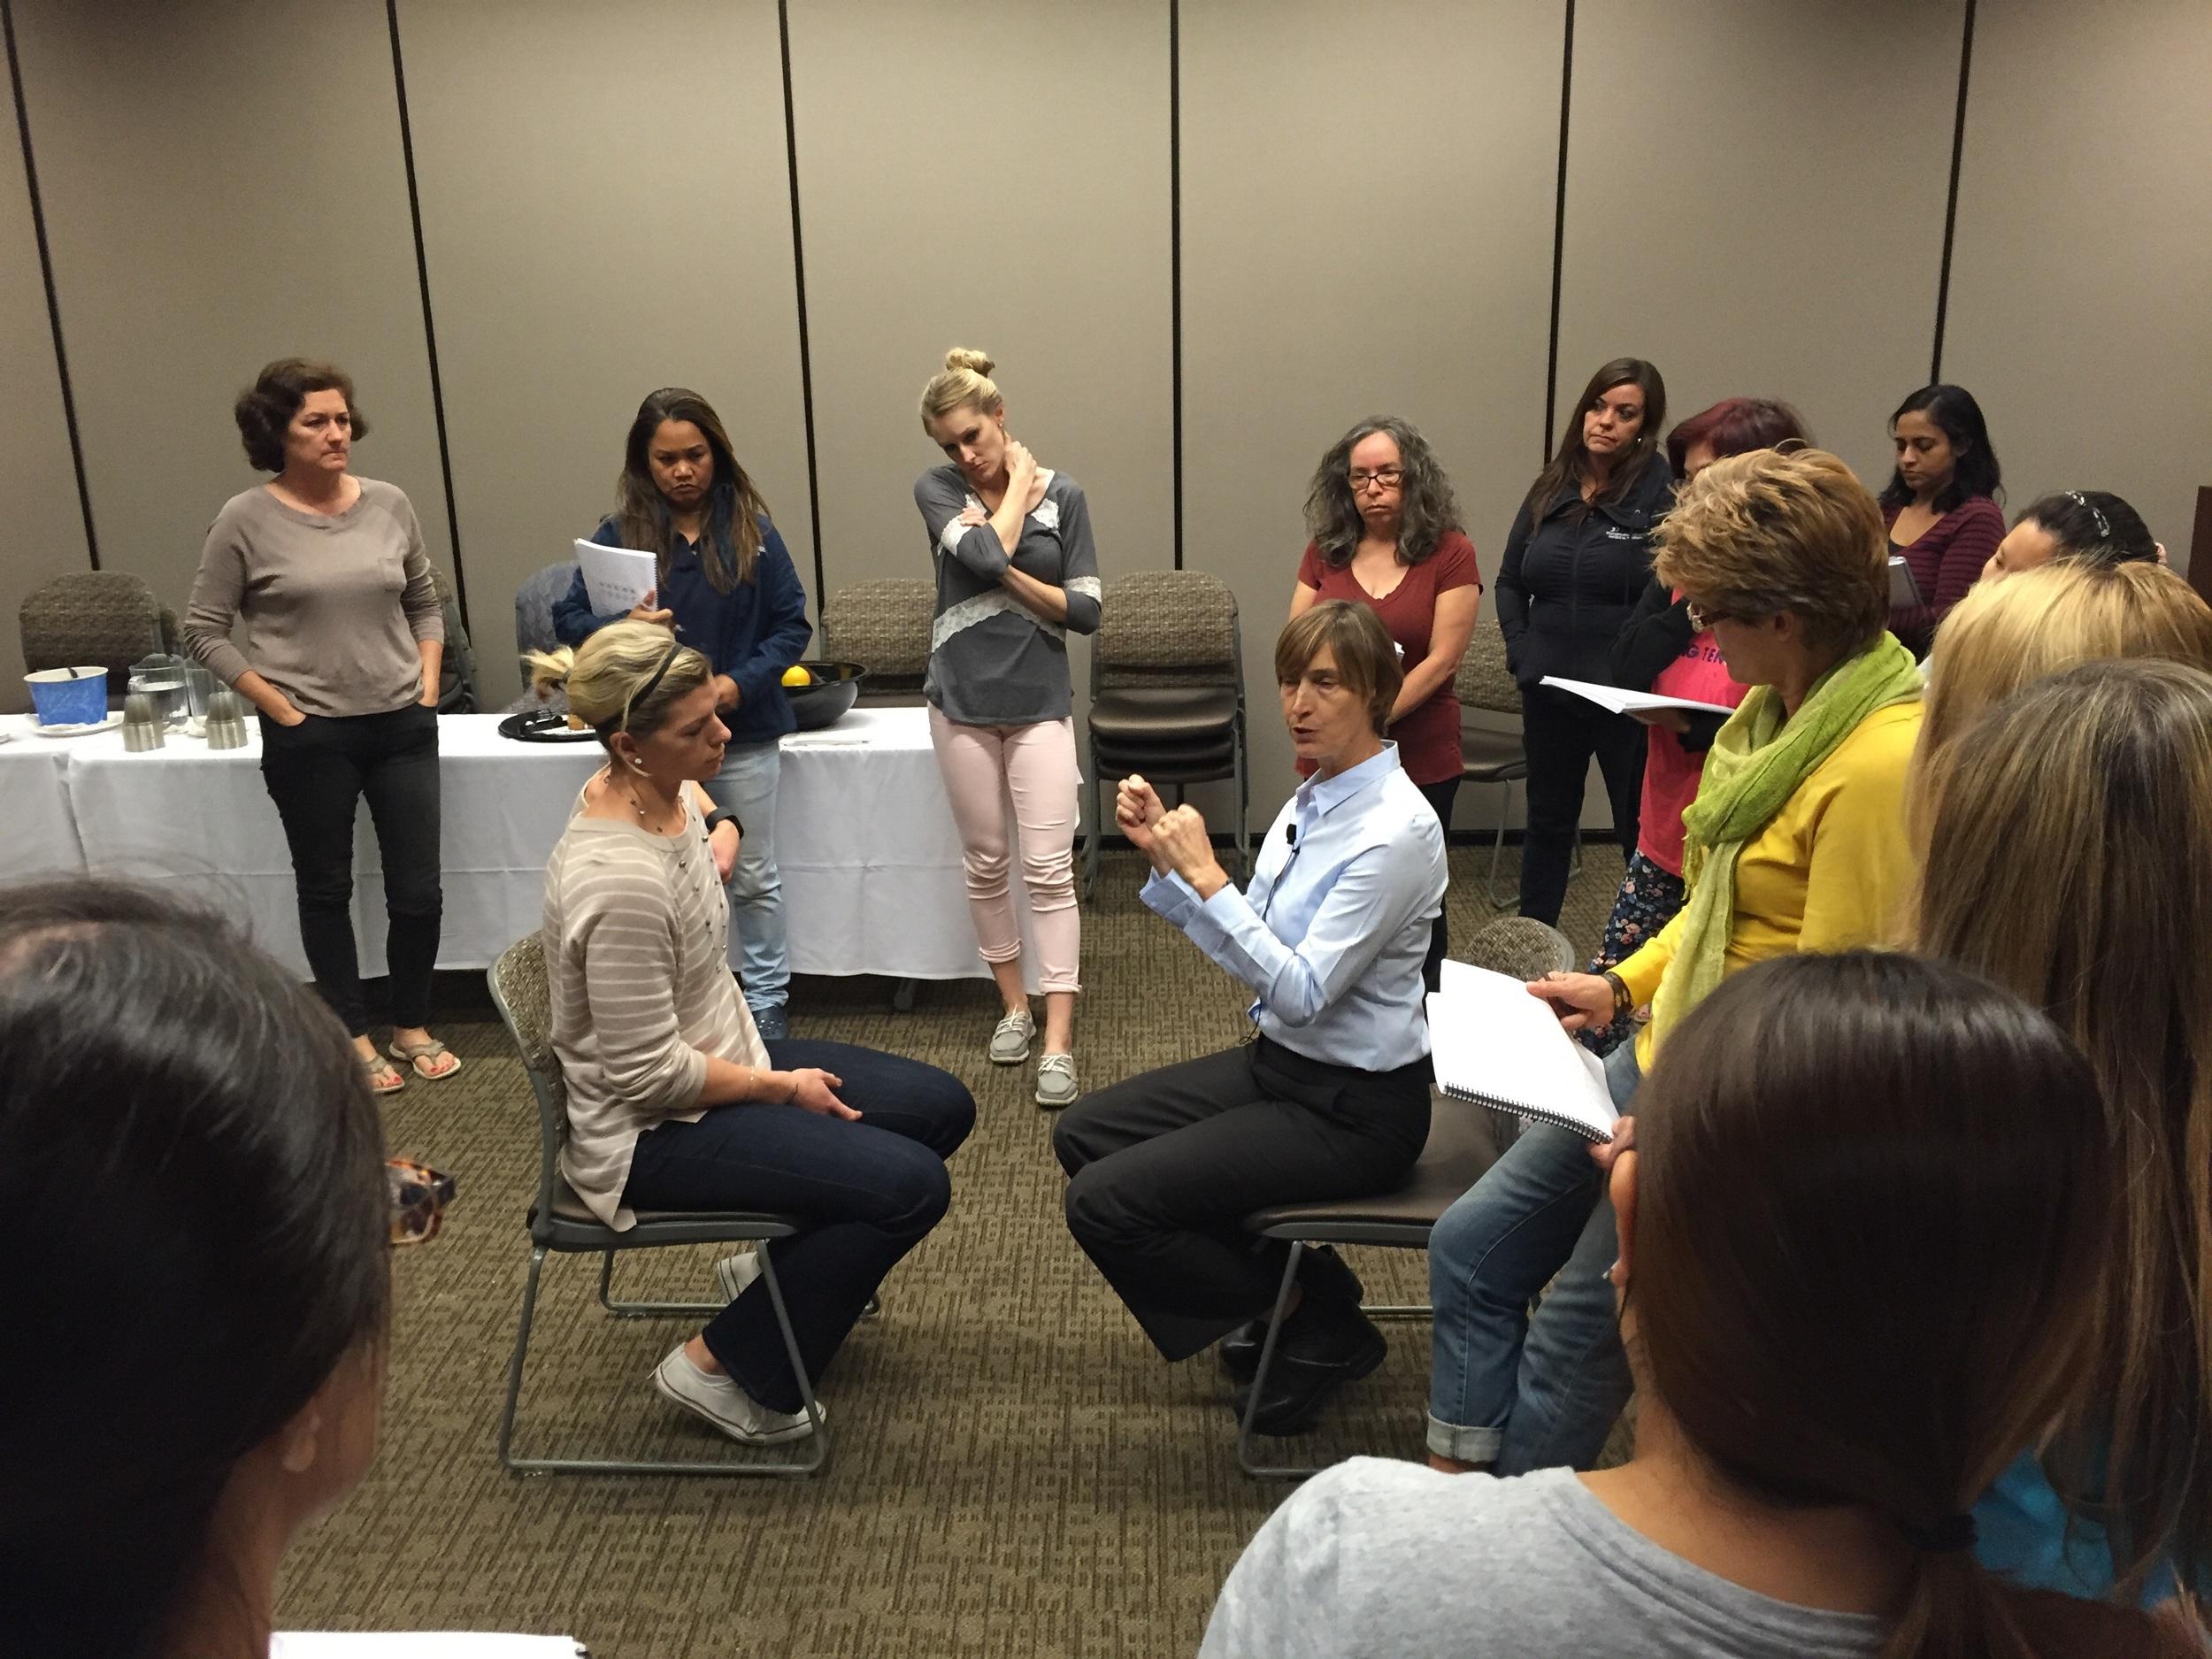 Wendy Wood center teaching the eye exam and vestibulo occular reflex portion of the class.